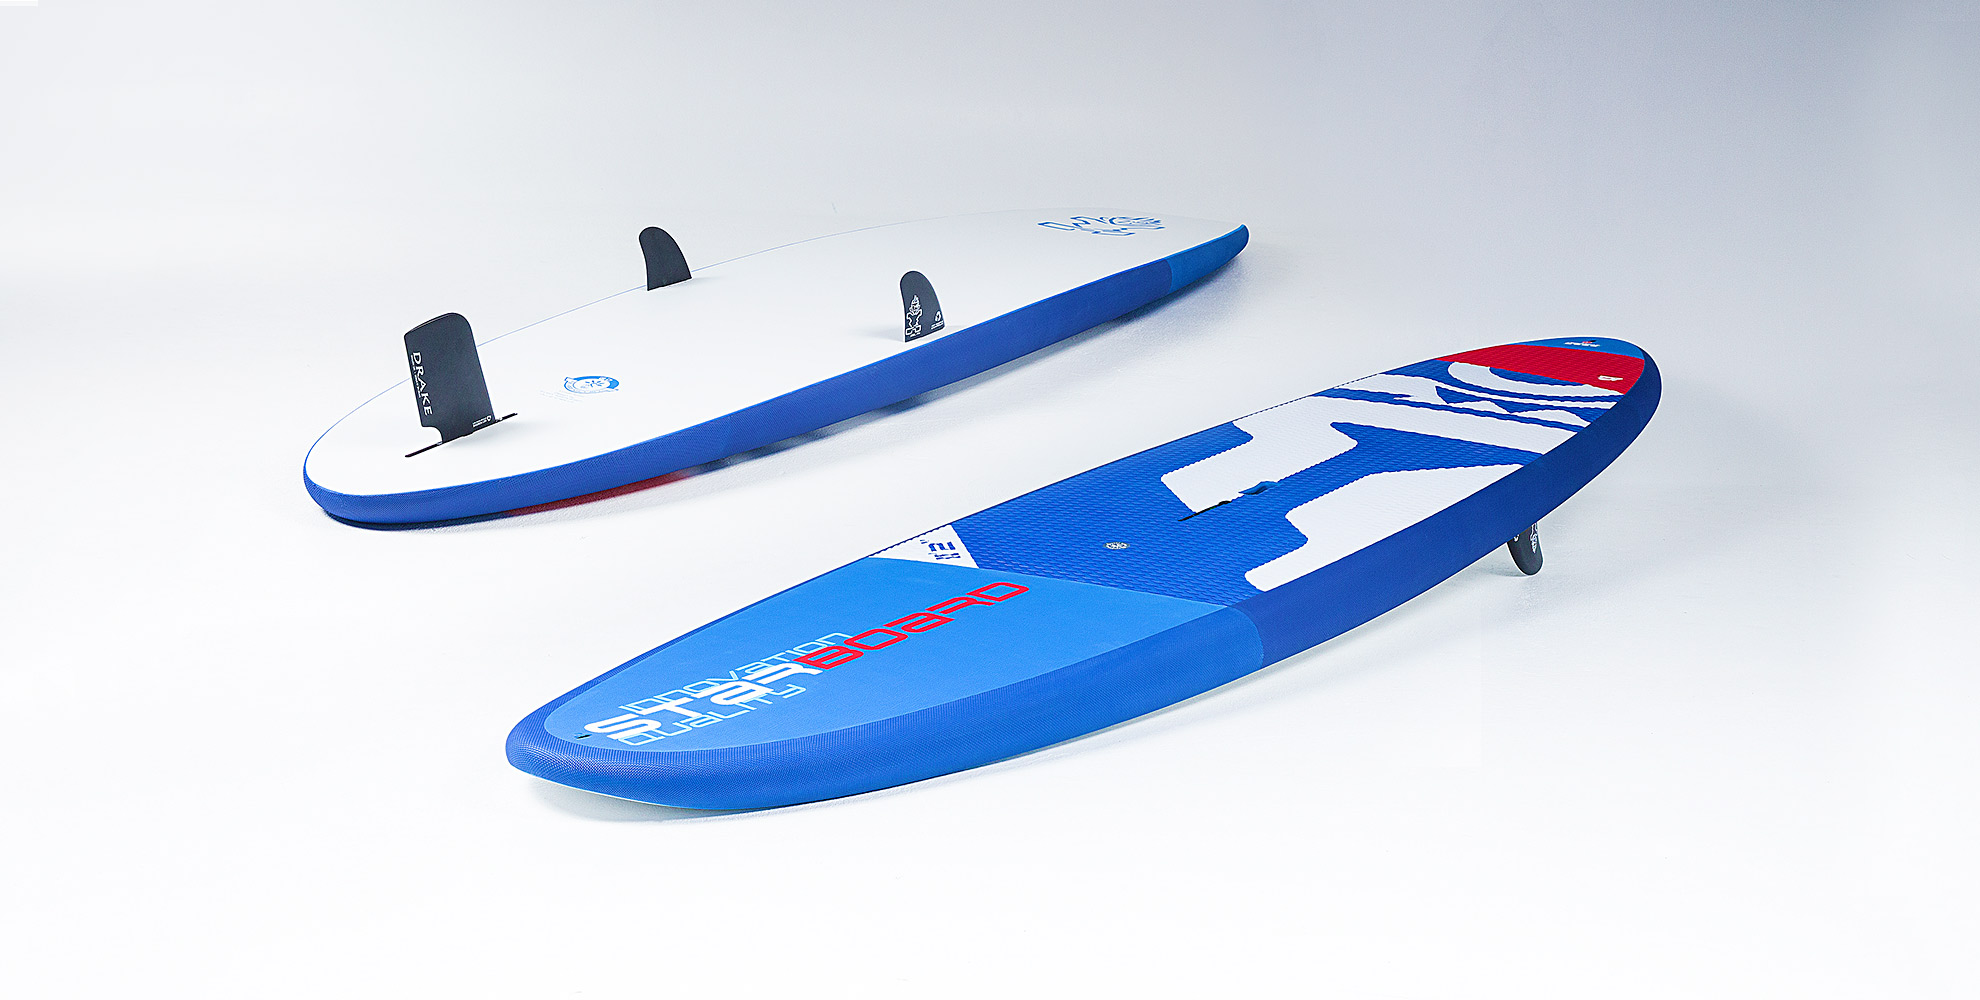 Starboard Start Beginner Windsurfing Sailboard Paddle Board Wide Stable Great!